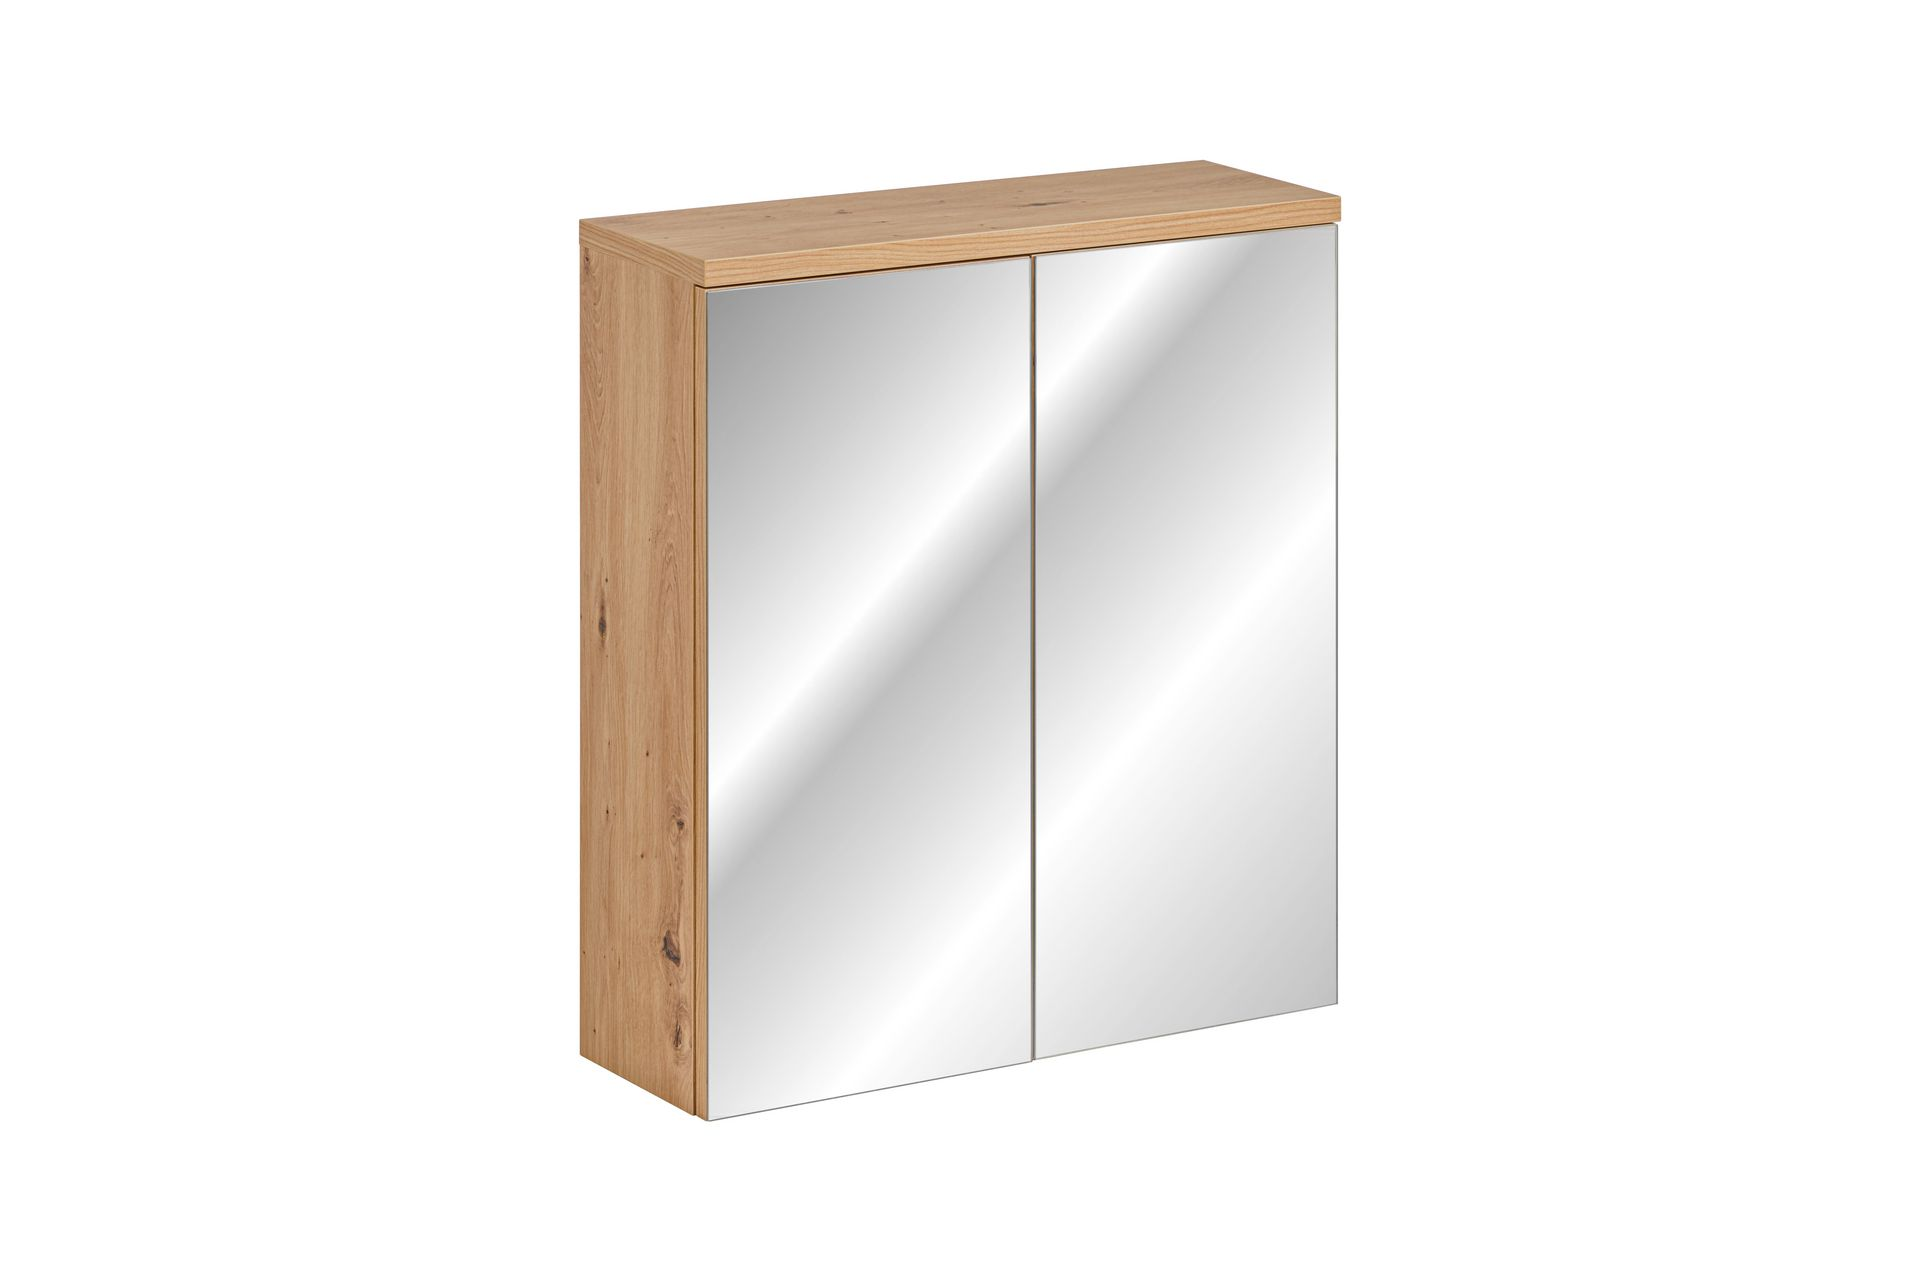 ArtCom Kúpeľňová zostava SAMOA Samoa: Zrkadlová skrinka Samoa 840 - 69 x 60 x 20 cm